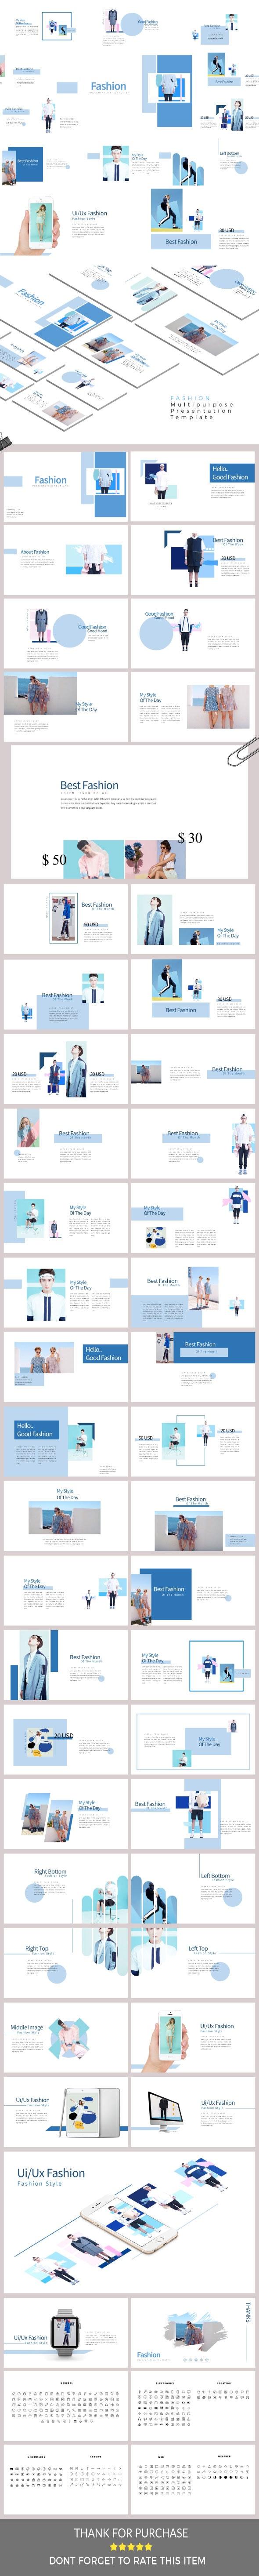 Fashion - Presentation Template - Google Slides Presentation Templates